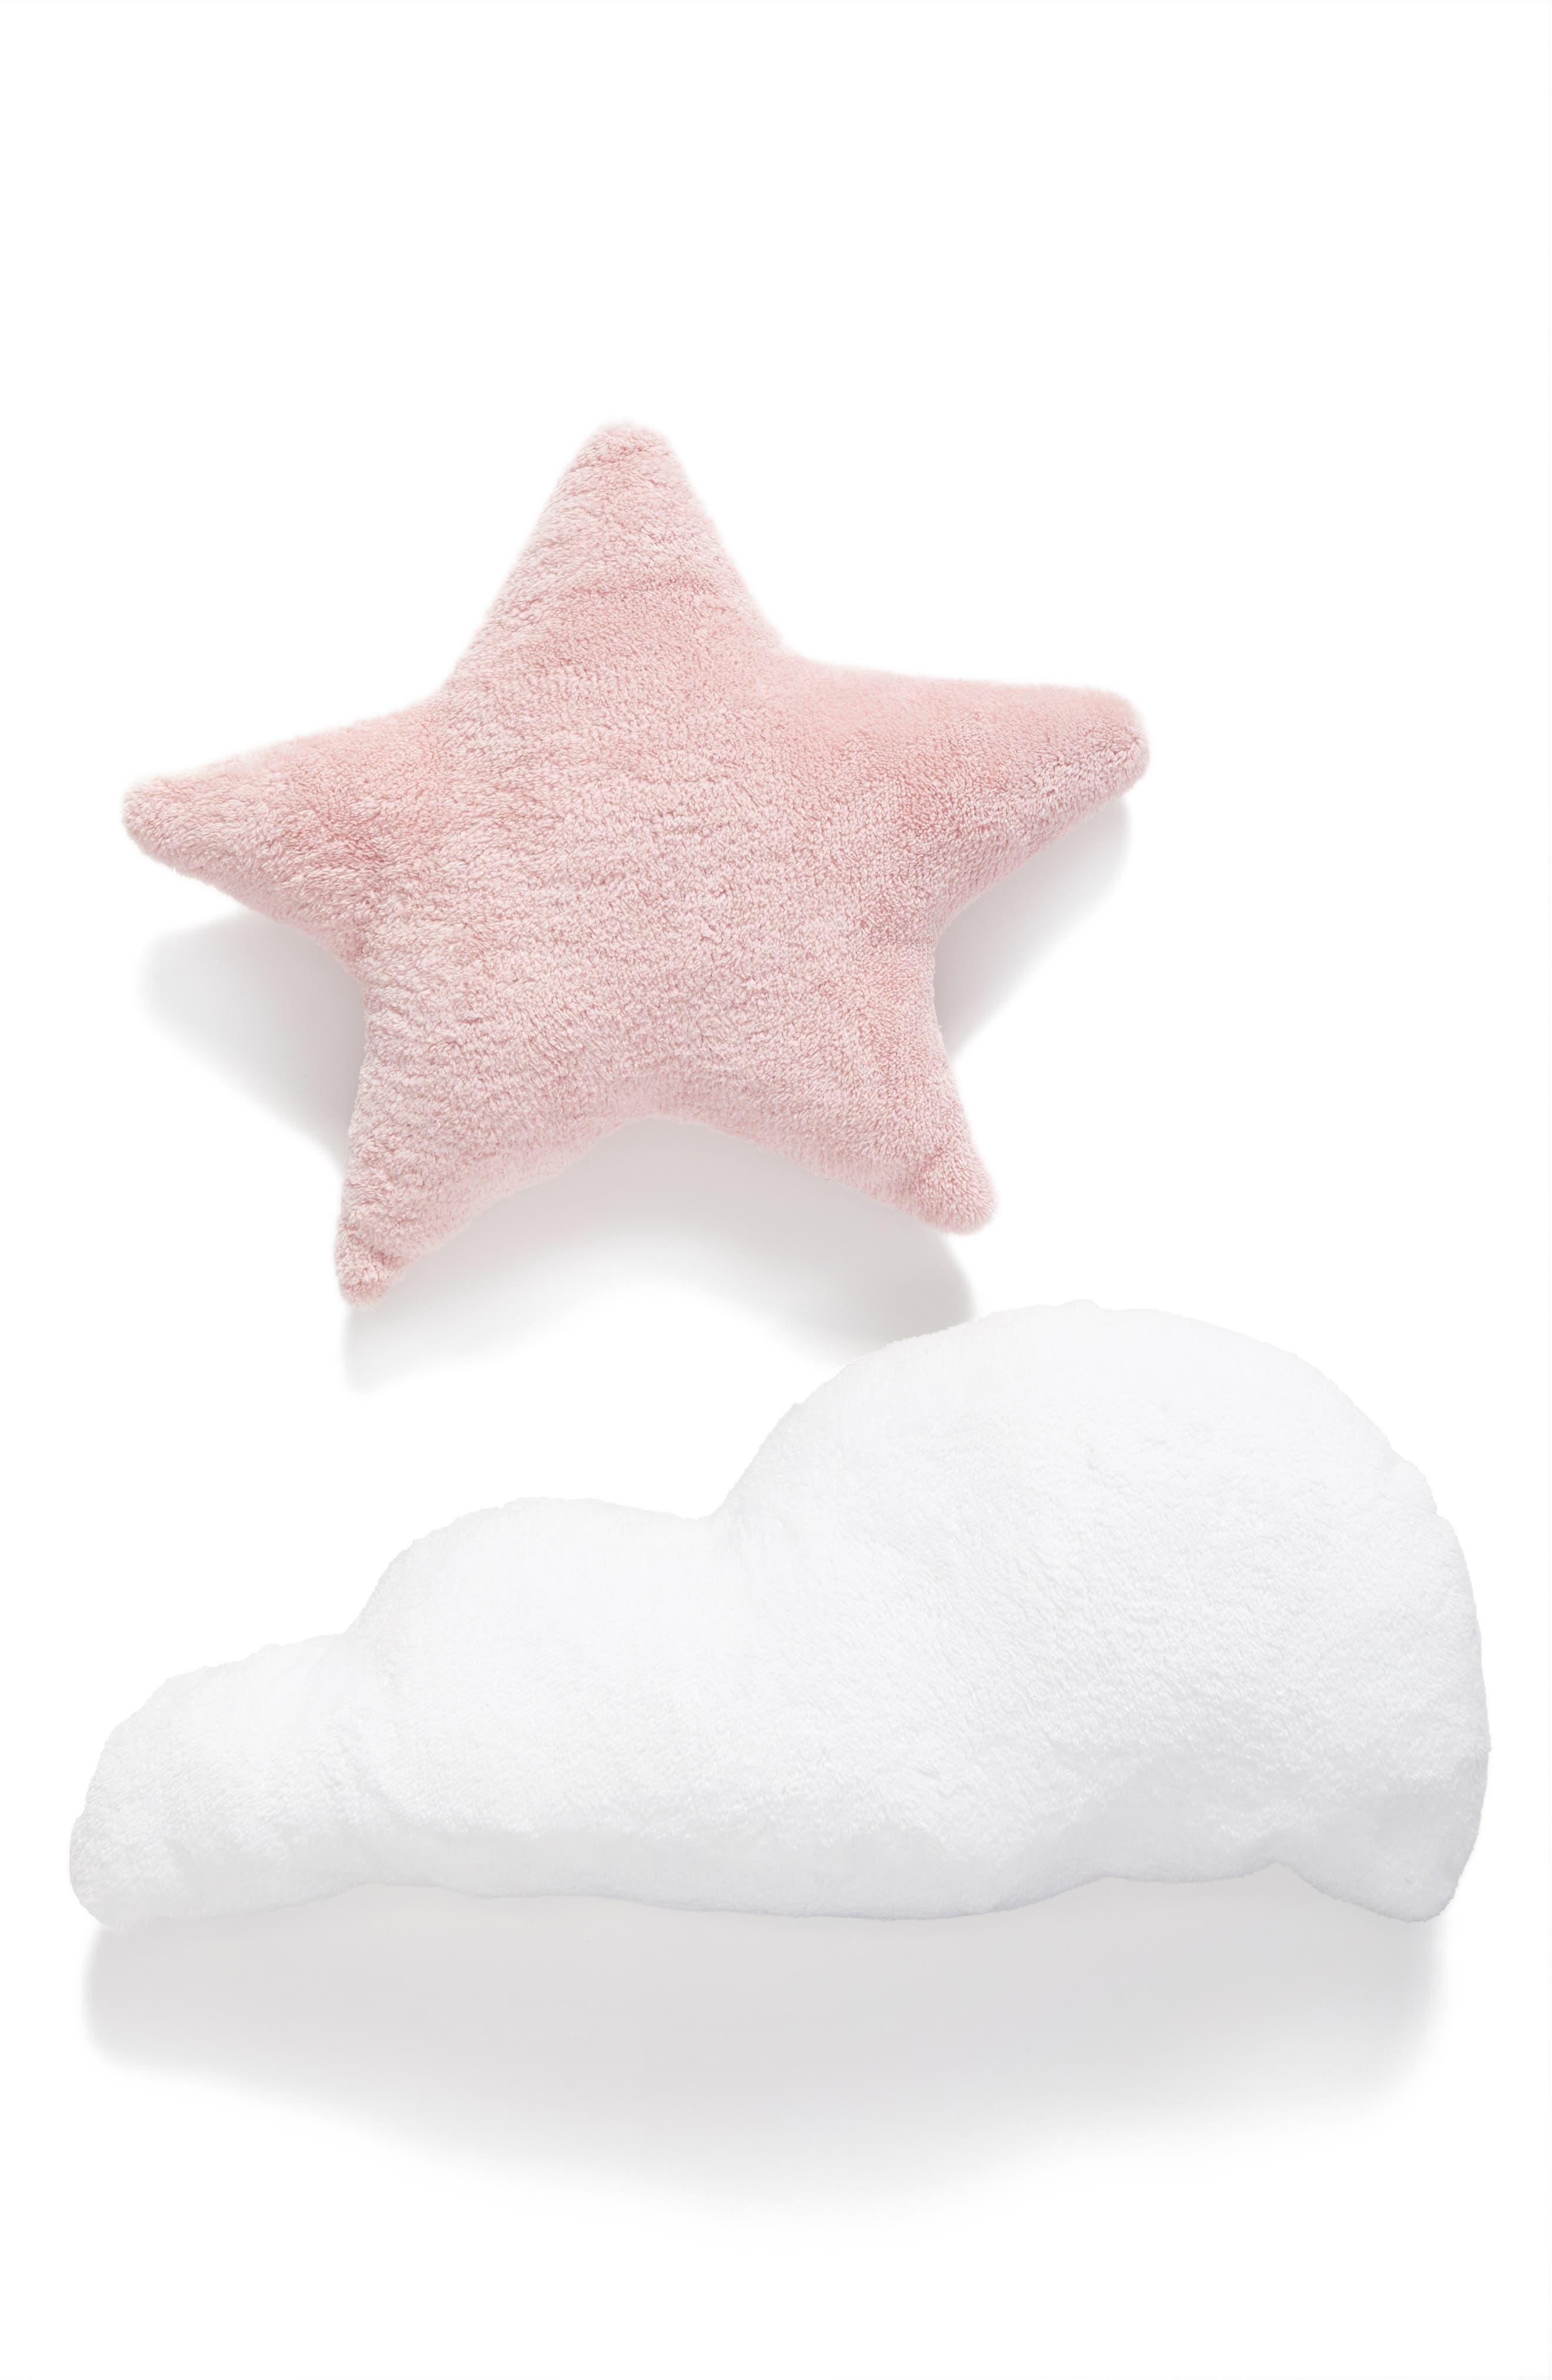 Oilo Cloud & Star Pillows